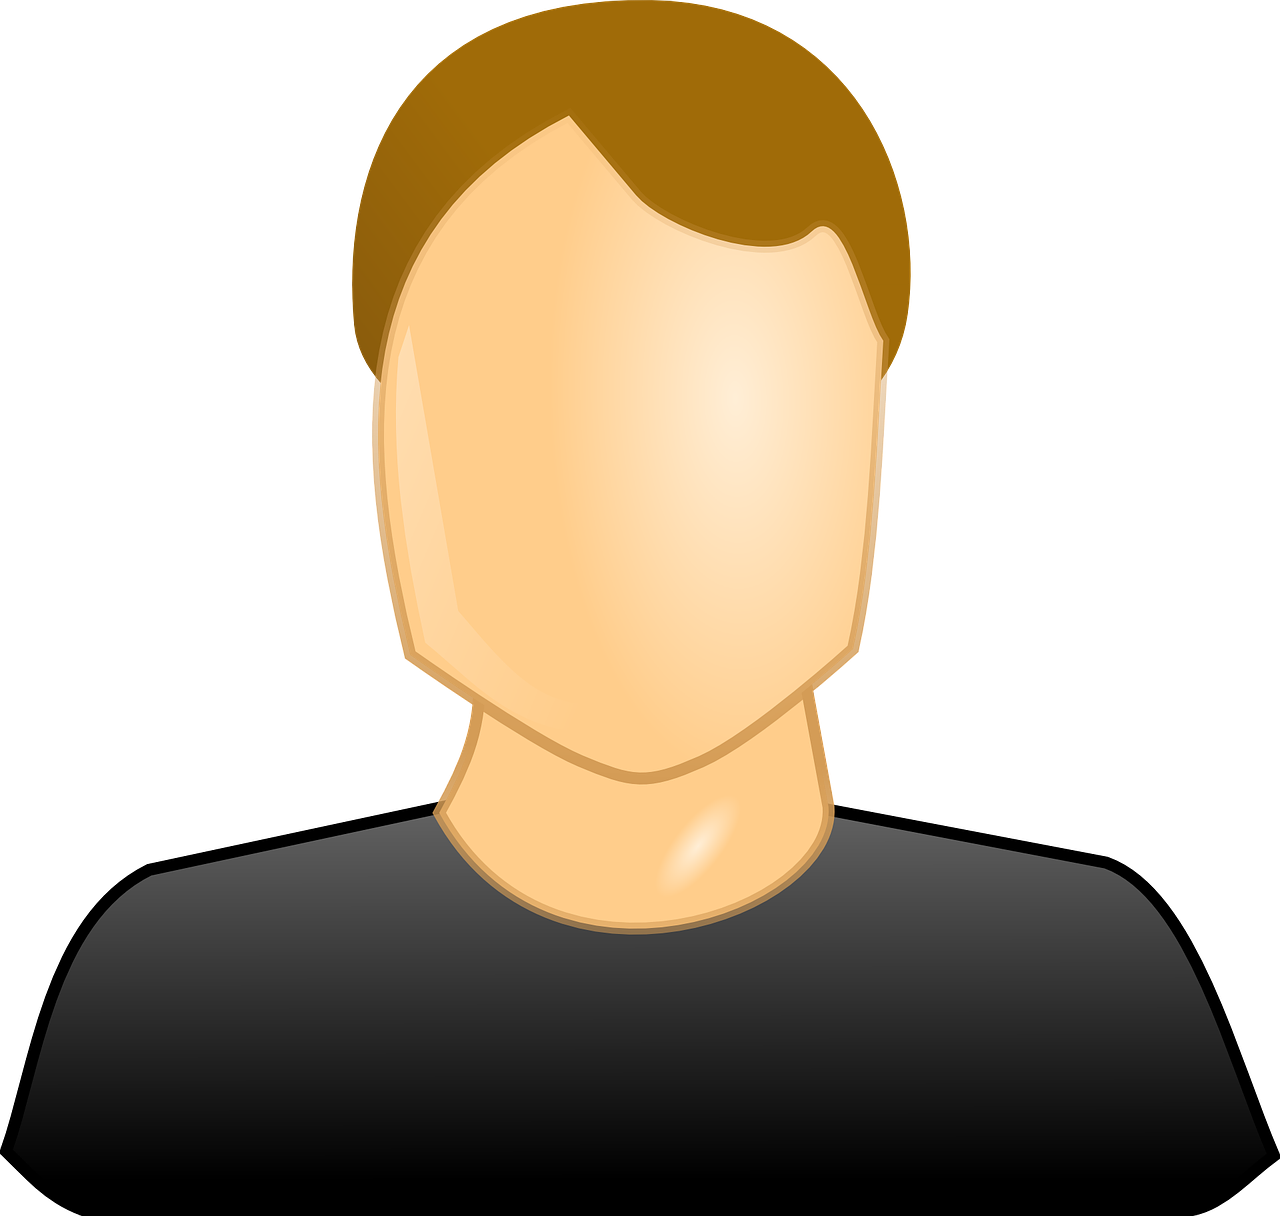 Human nose profile